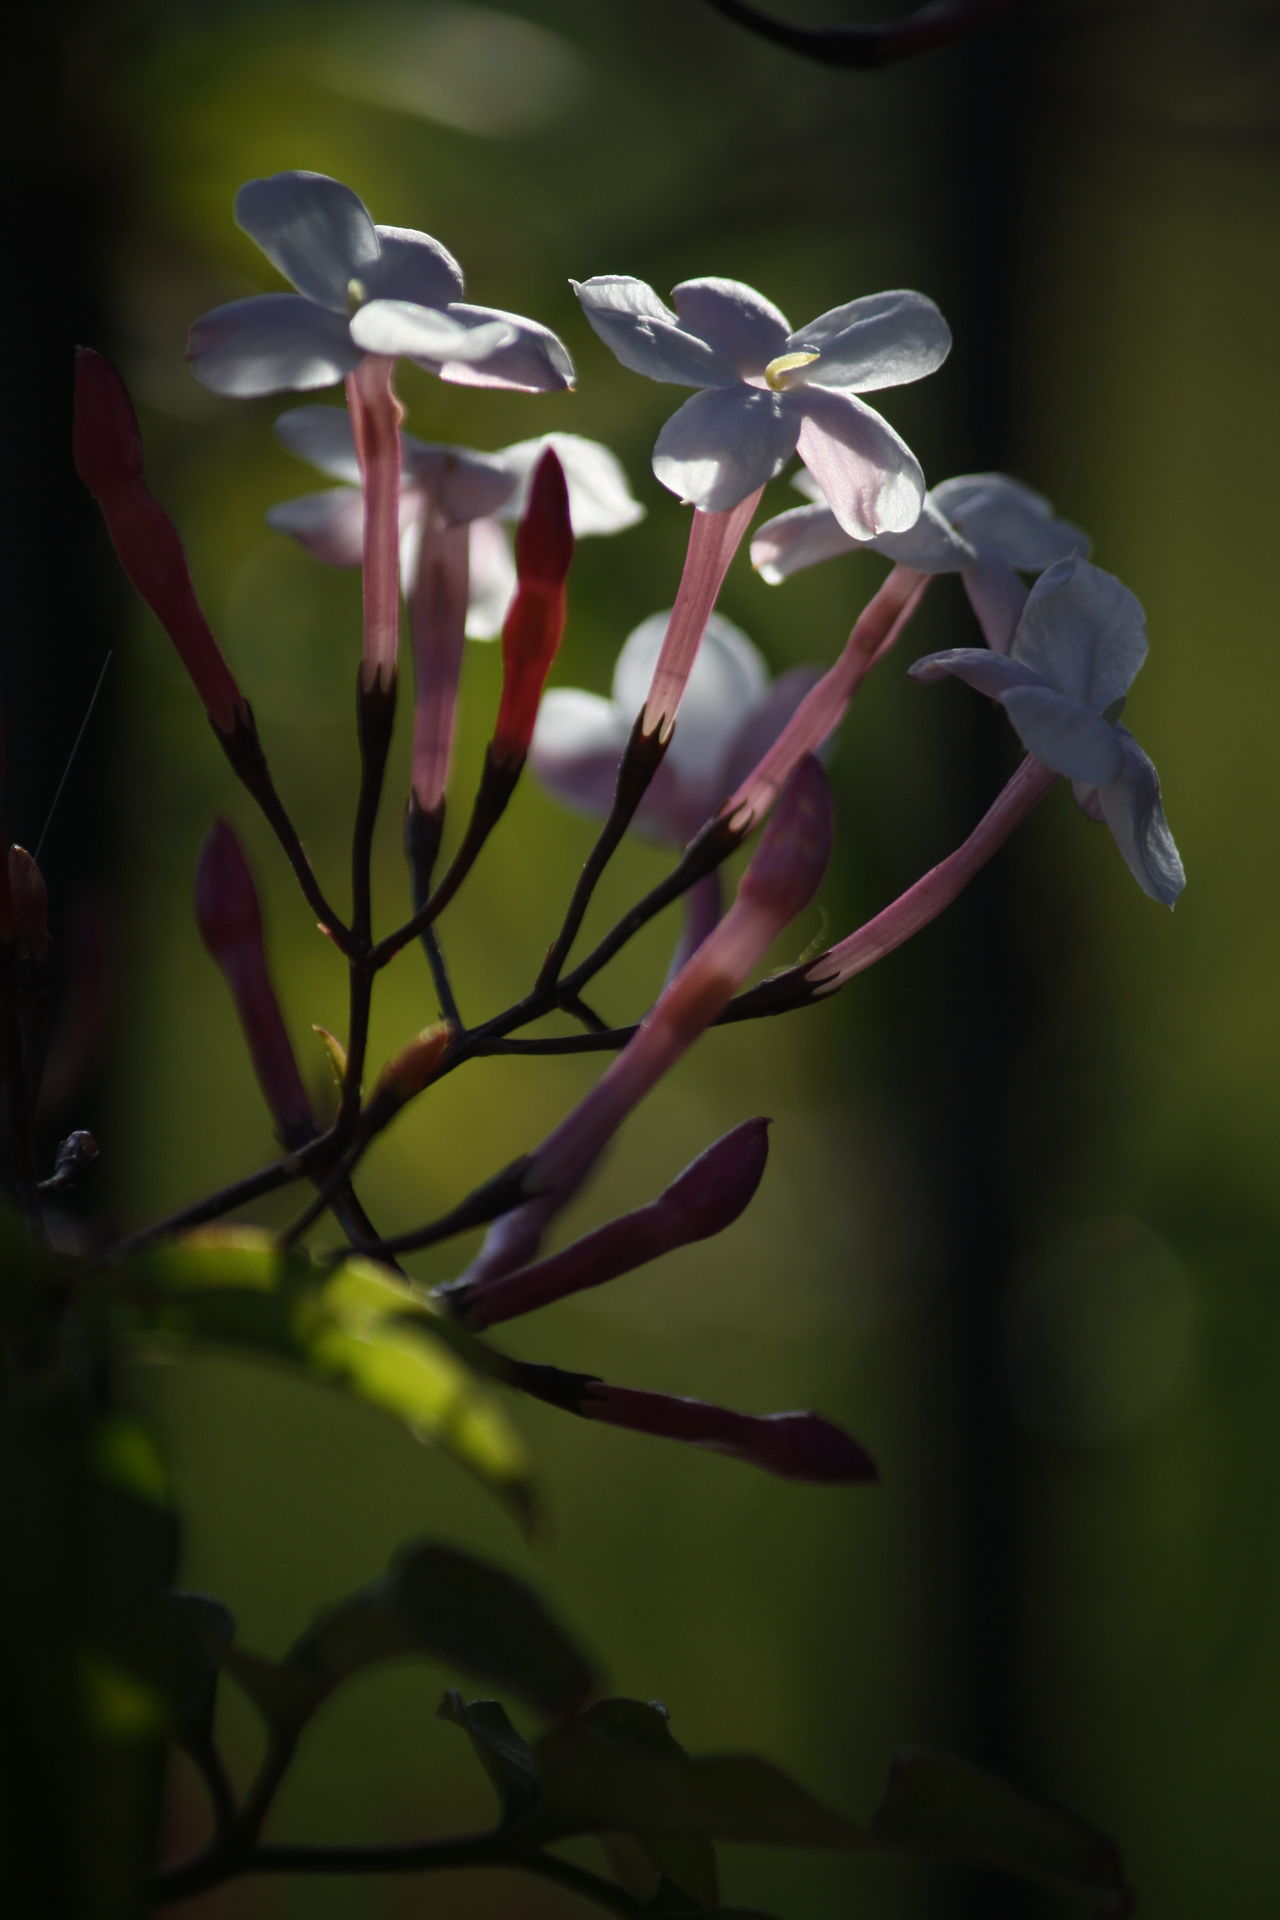 Jasmine Flower Nature Photography